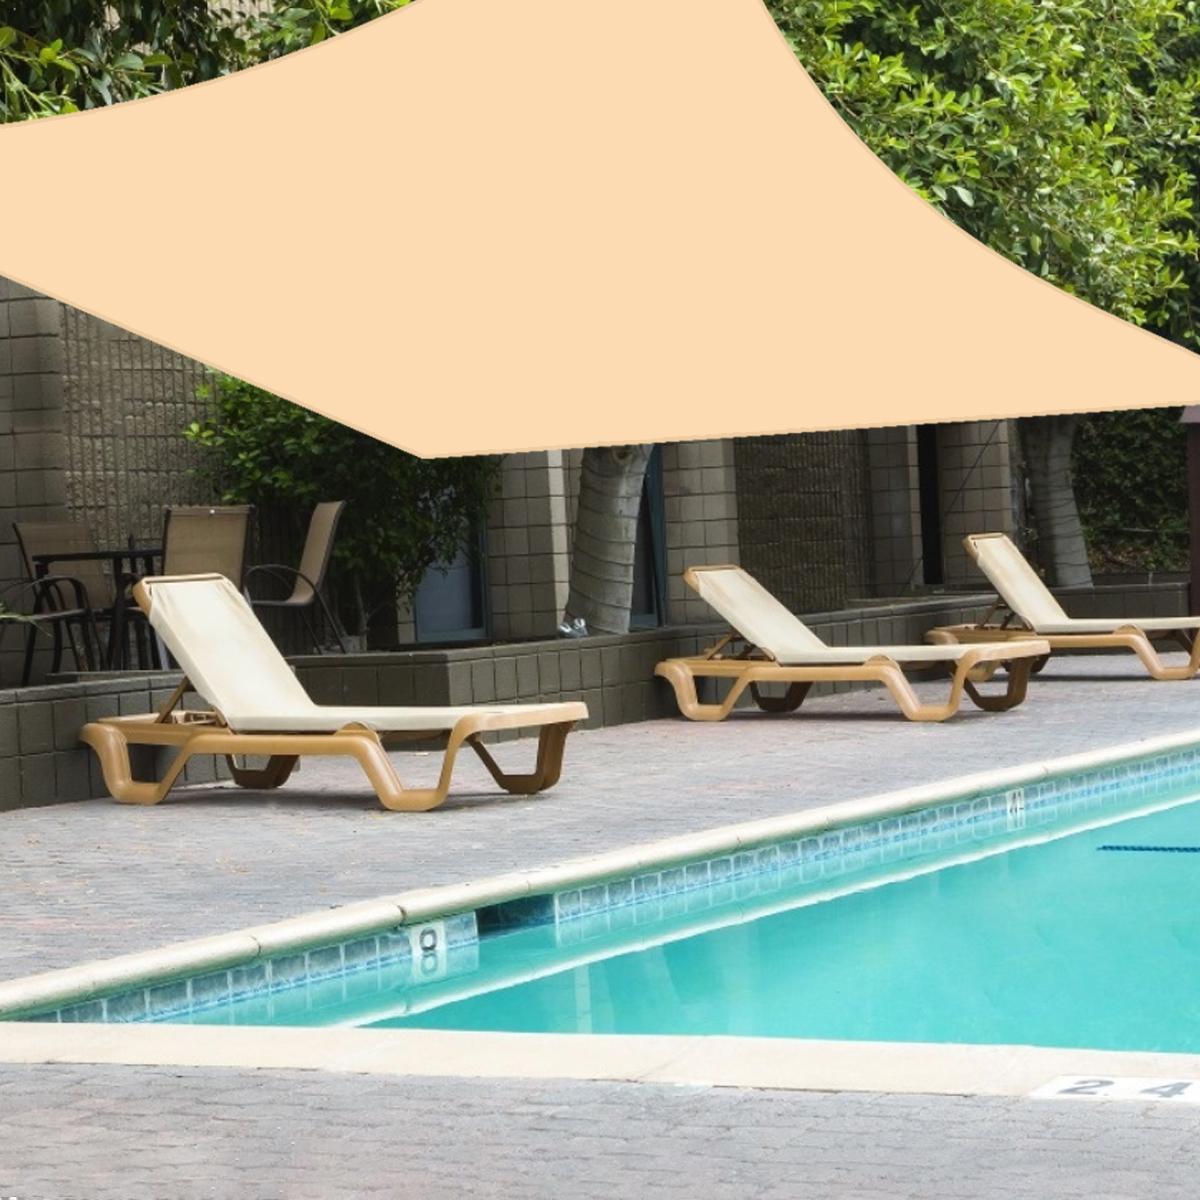 20x20 6 6m garden decor outdoor patio sun shade cloth with grommets garden sun shade sails canopy shelter cover sunshades for yard